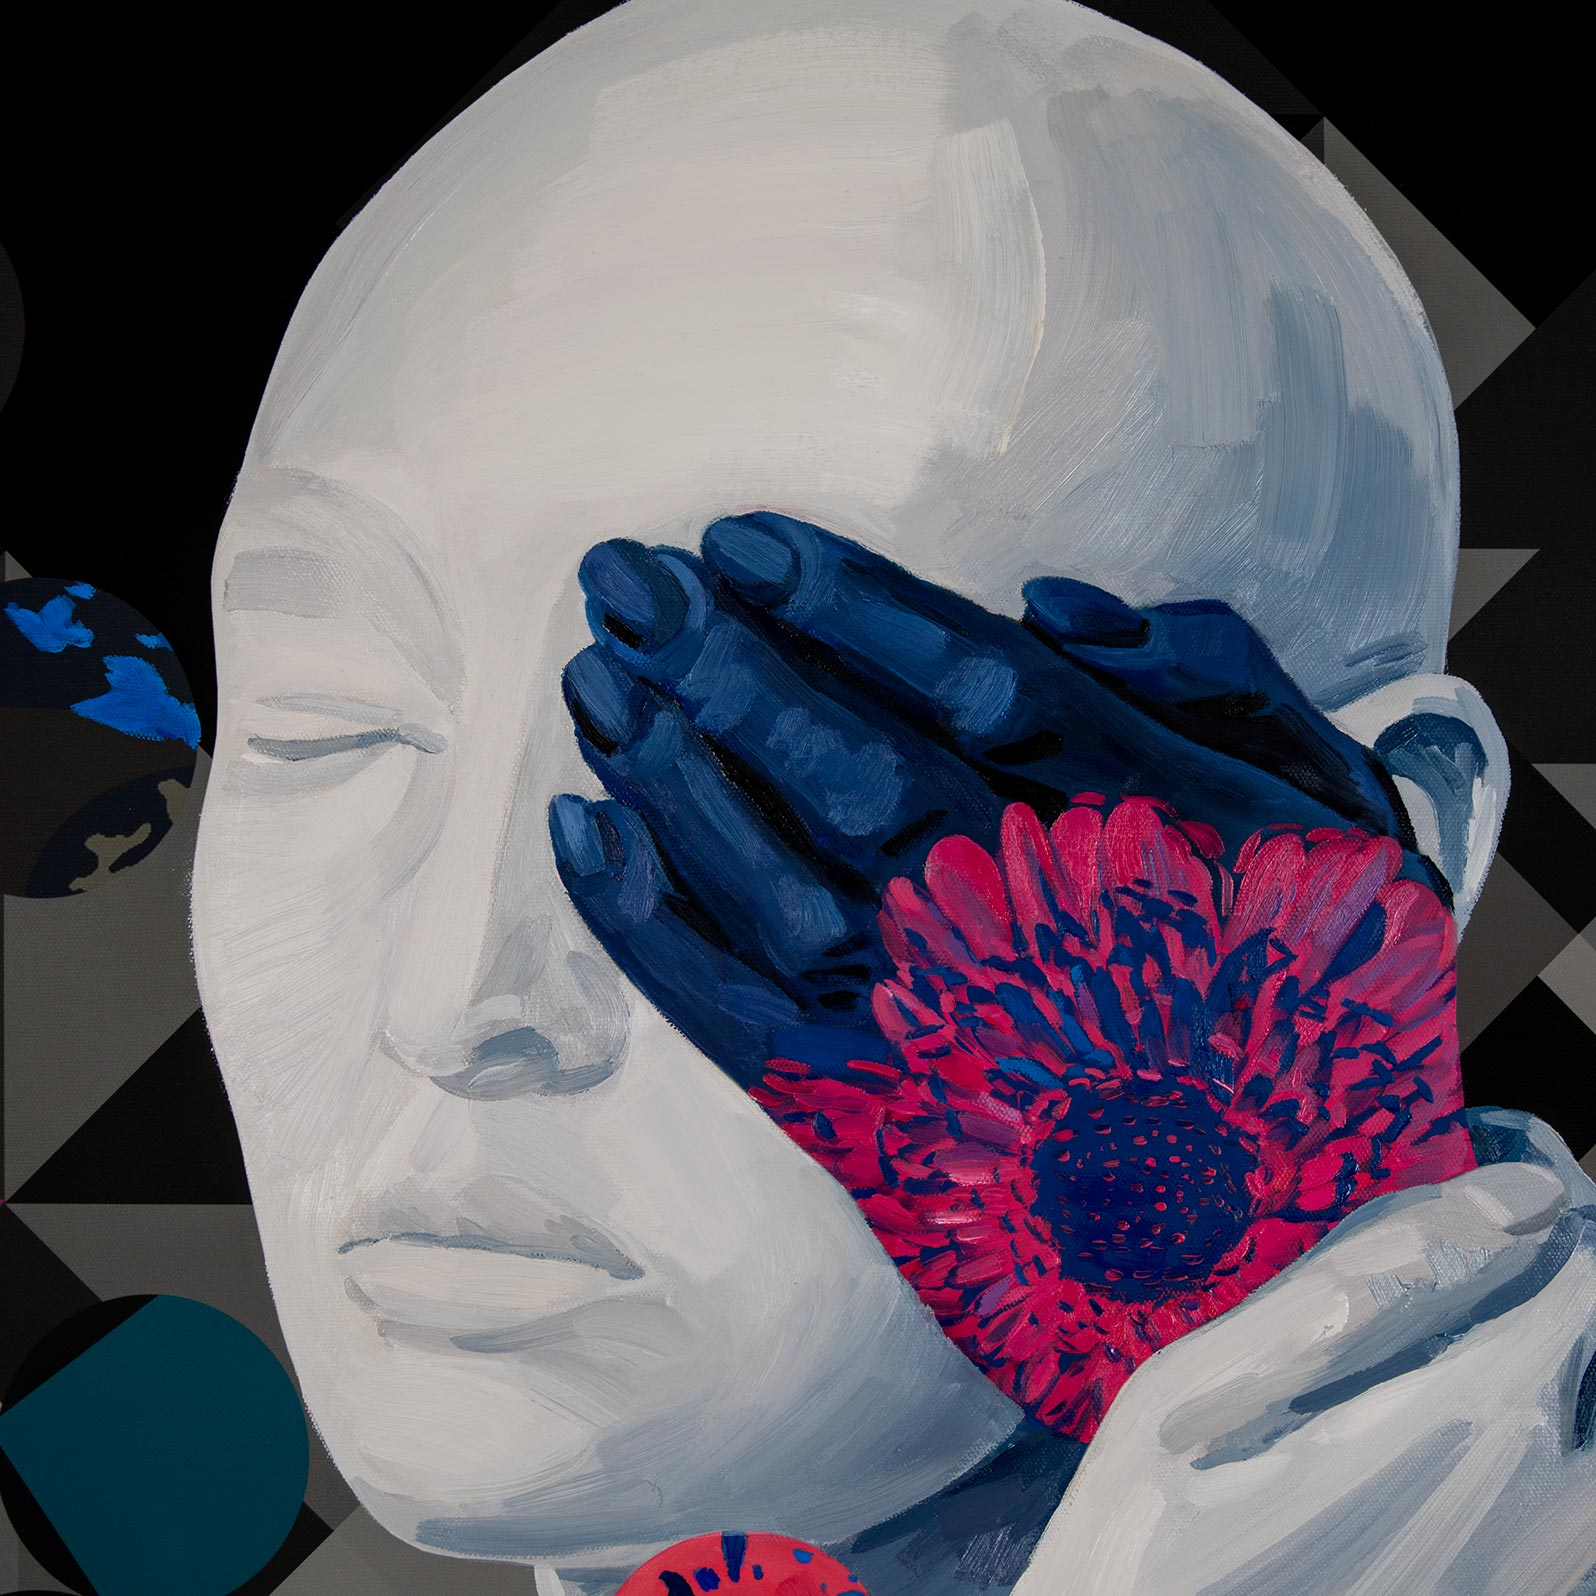 Anca Stefanescu | Modern Oil Painting Artists, AnotherPortionOfSelf